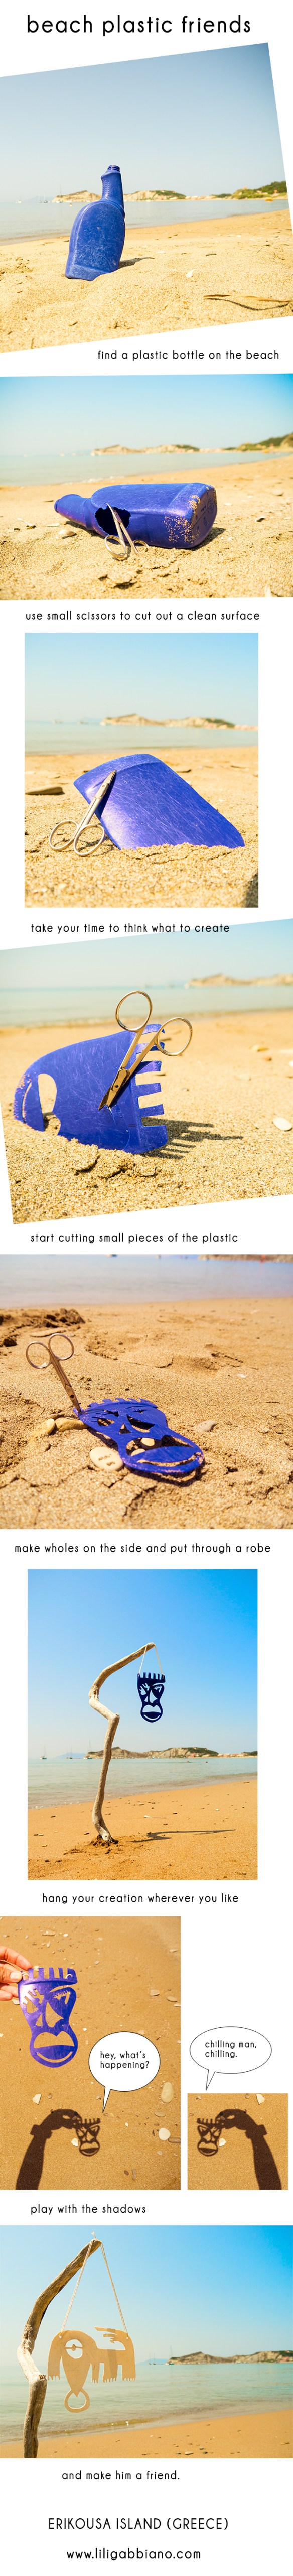 diy-beach-plastic-figure